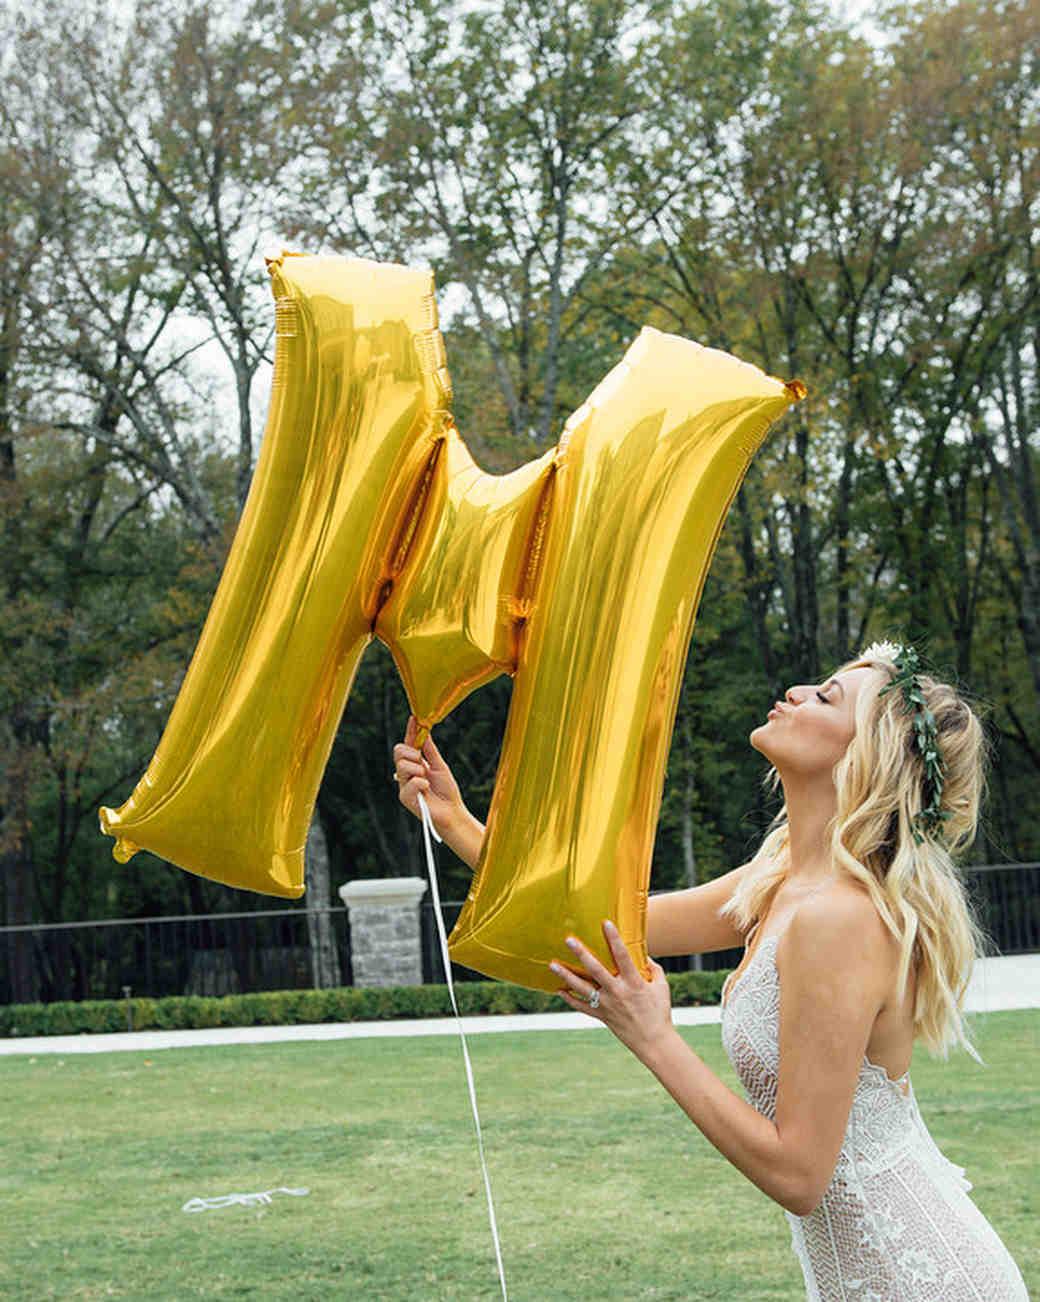 kelsea ballerini bridal shower balloon